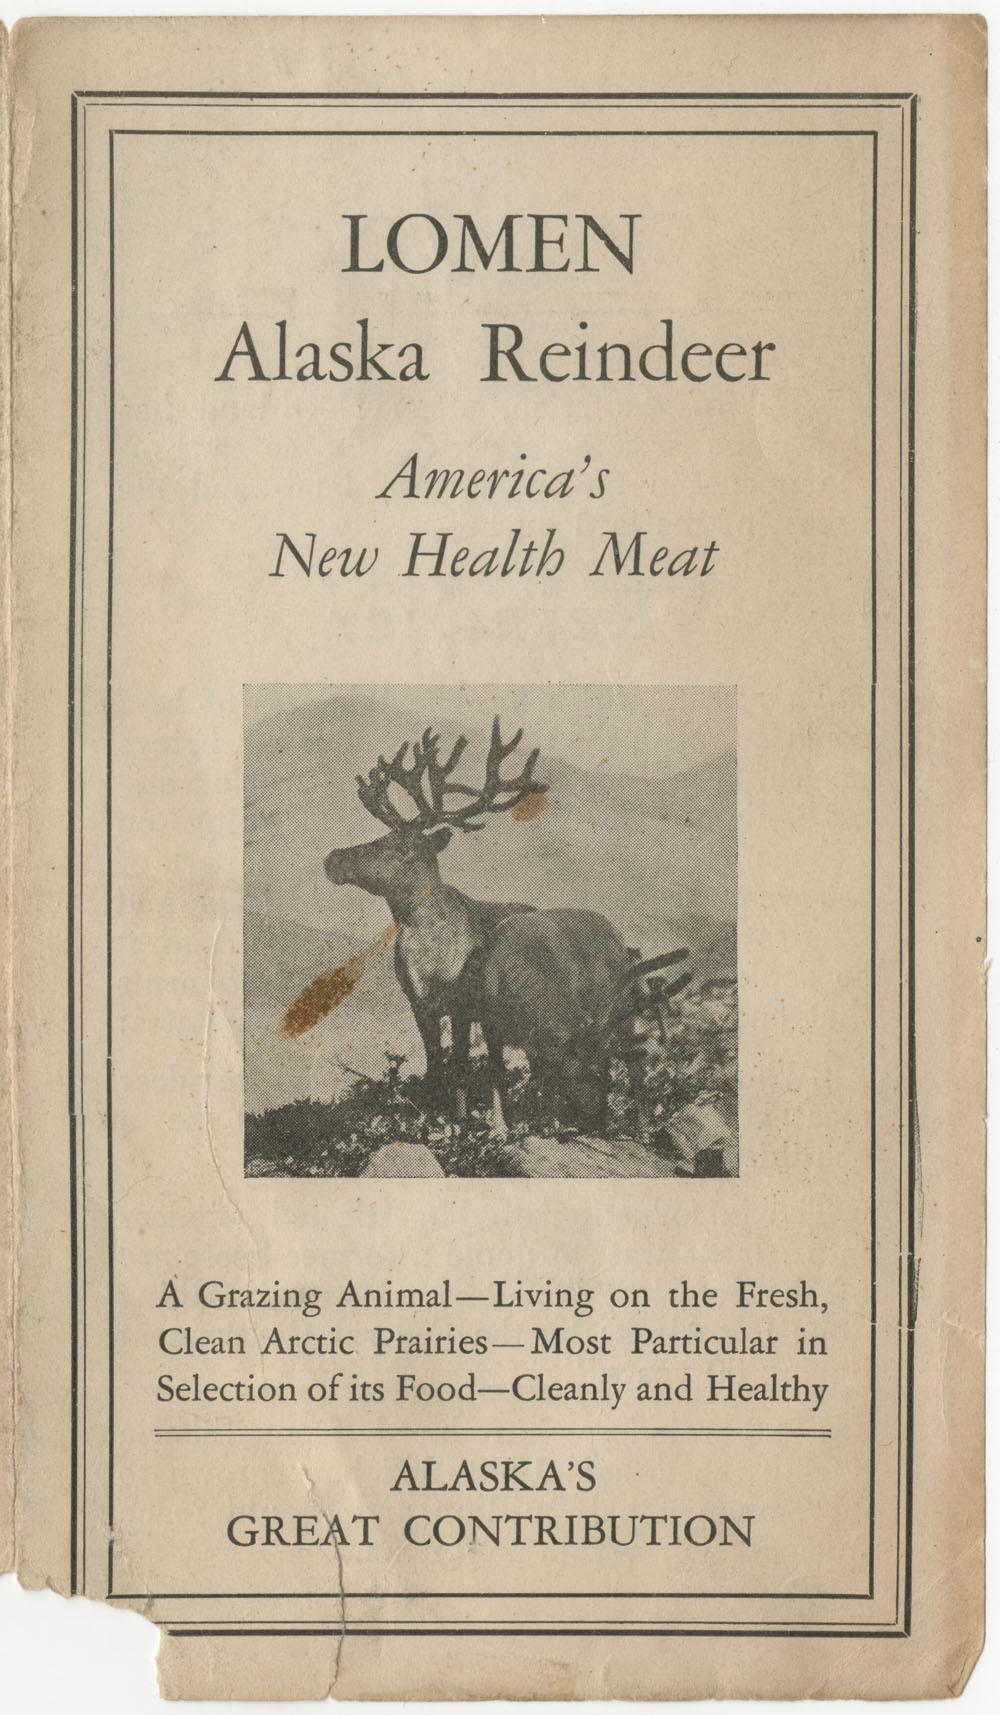 Lomen Alaska reindeer: America's new health meat, circa 1920 Catalog record